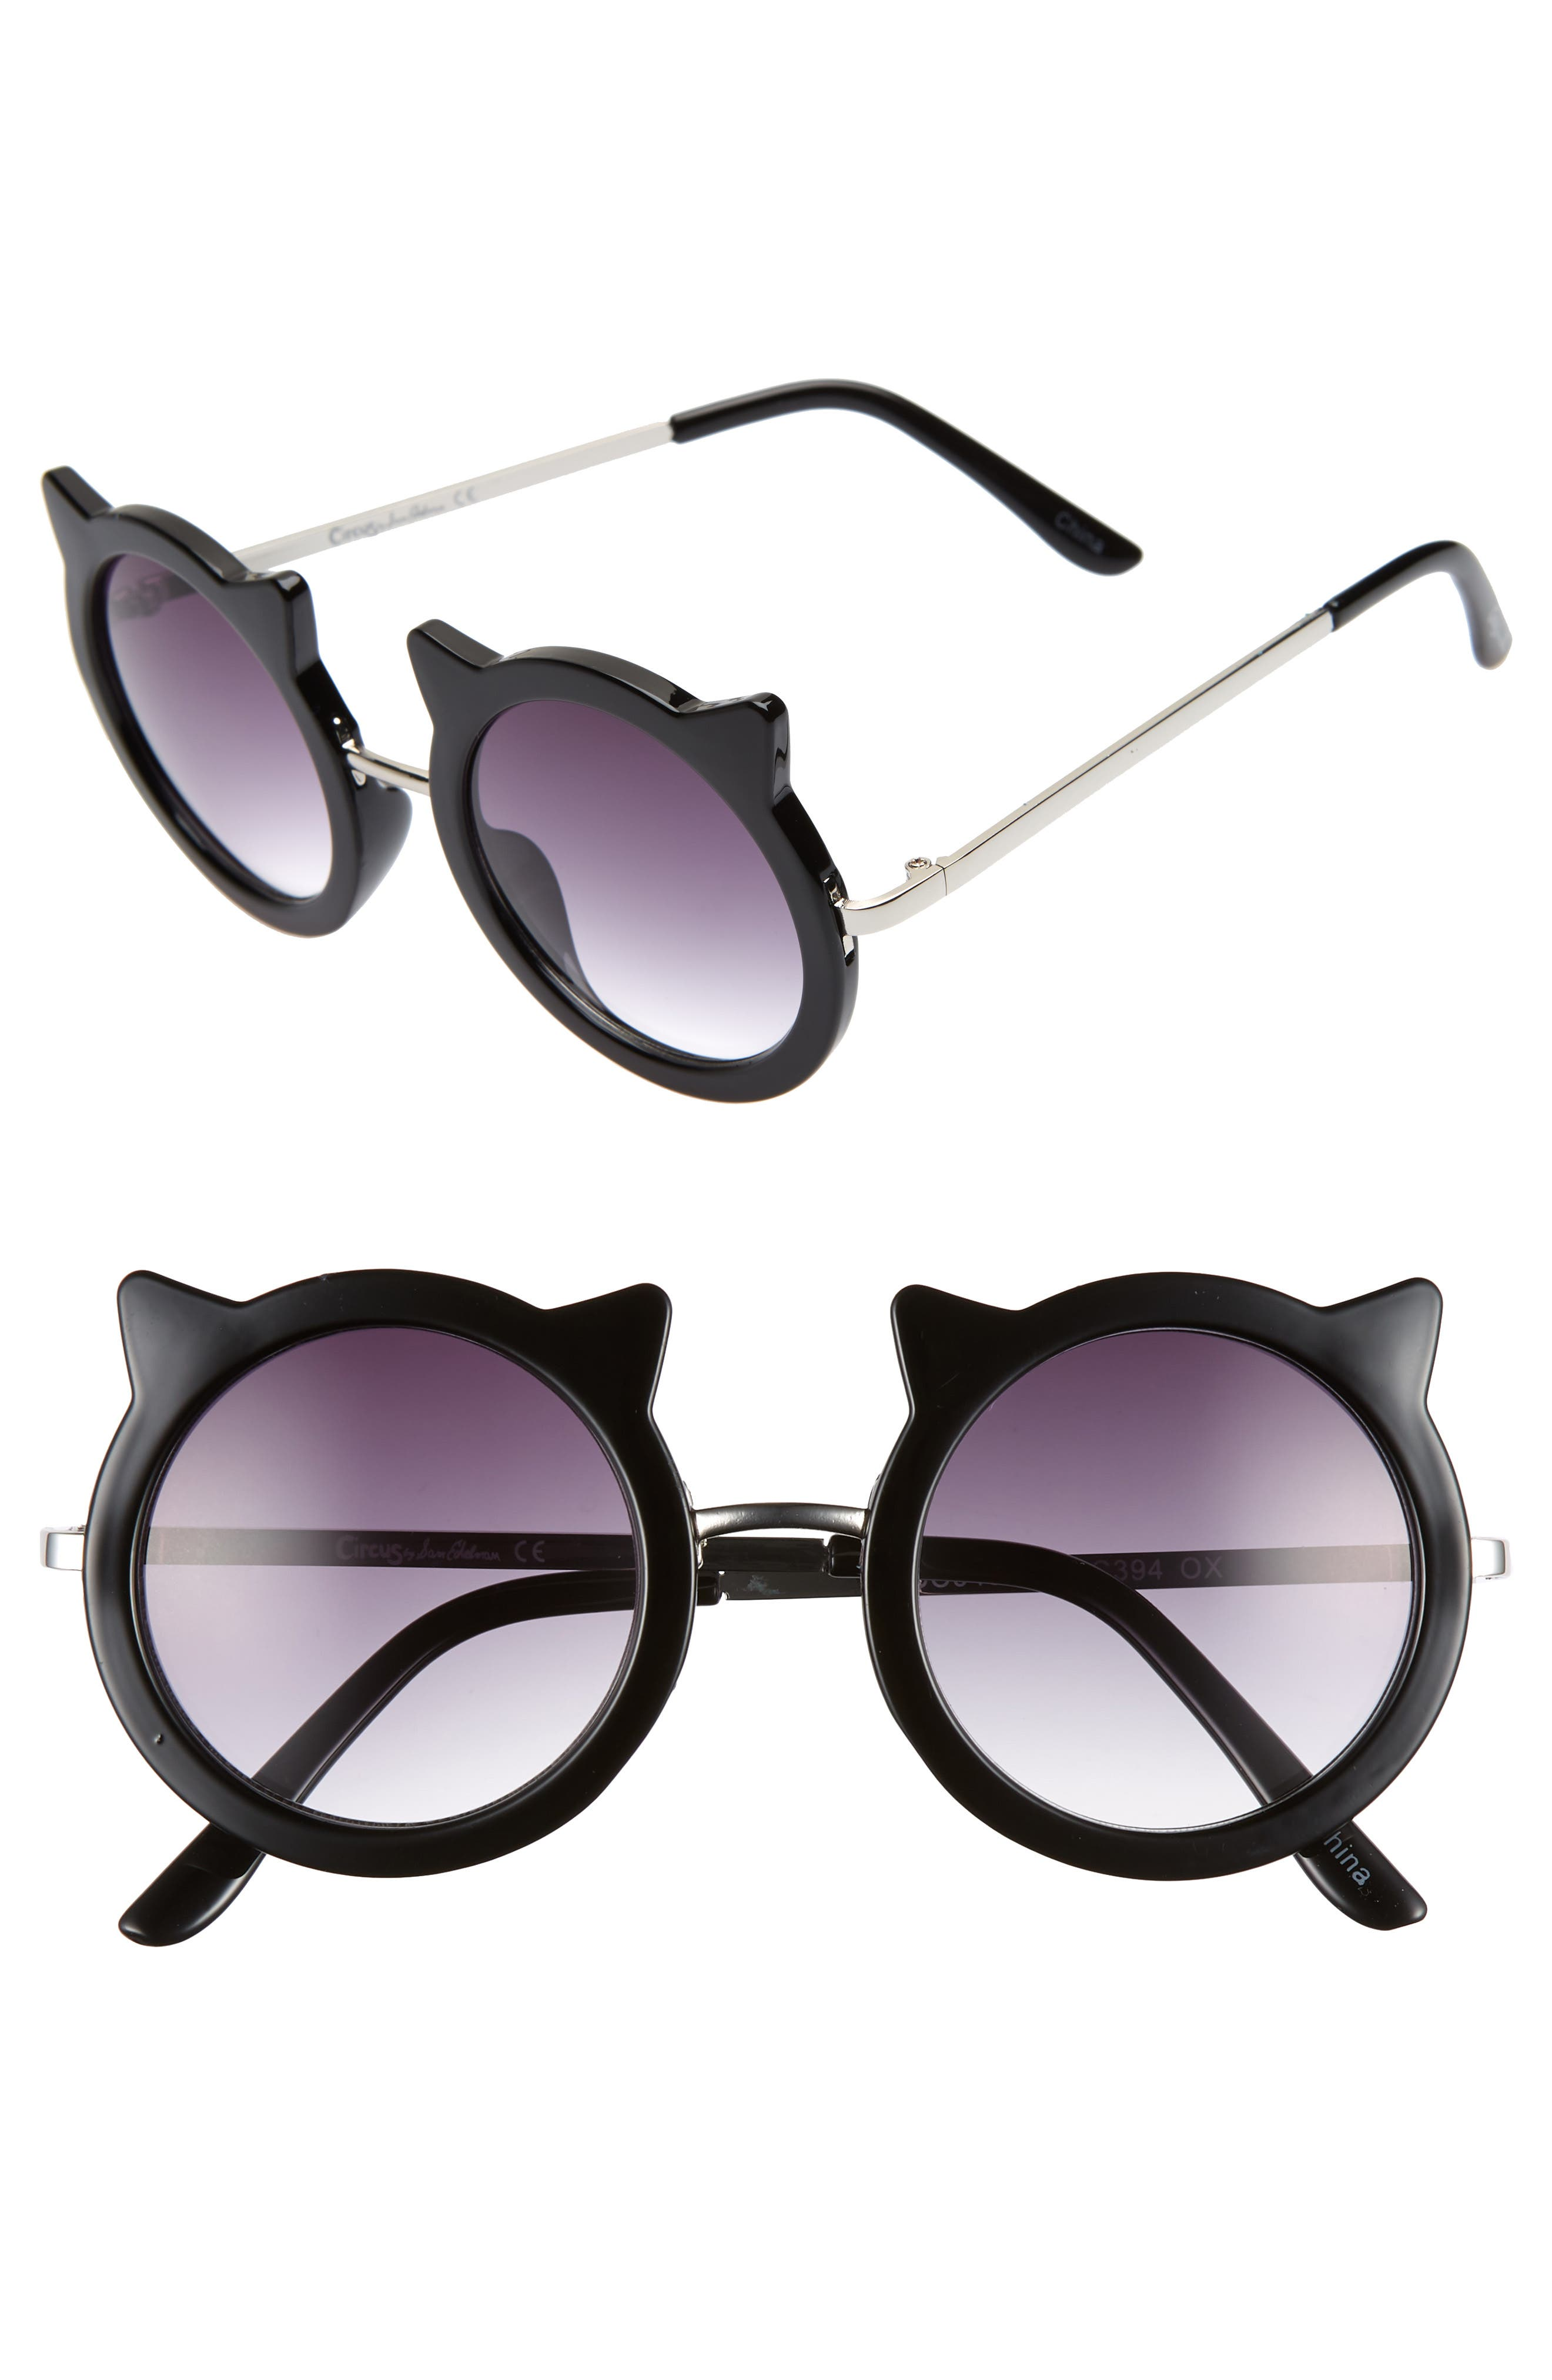 CIRCUS BY SAM EDELMAN 48Mm Round Cat Sunglasses - Black